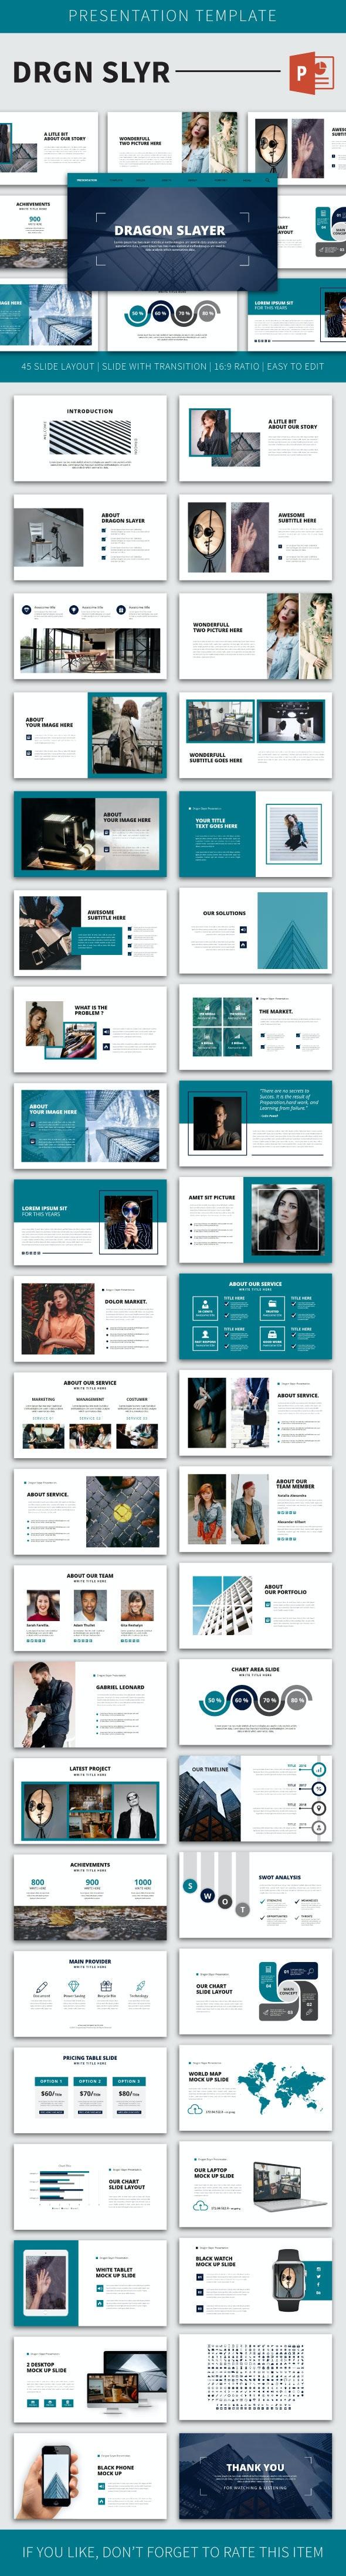 Drgnslyr PowerPoint Temp - Business PowerPoint Templates